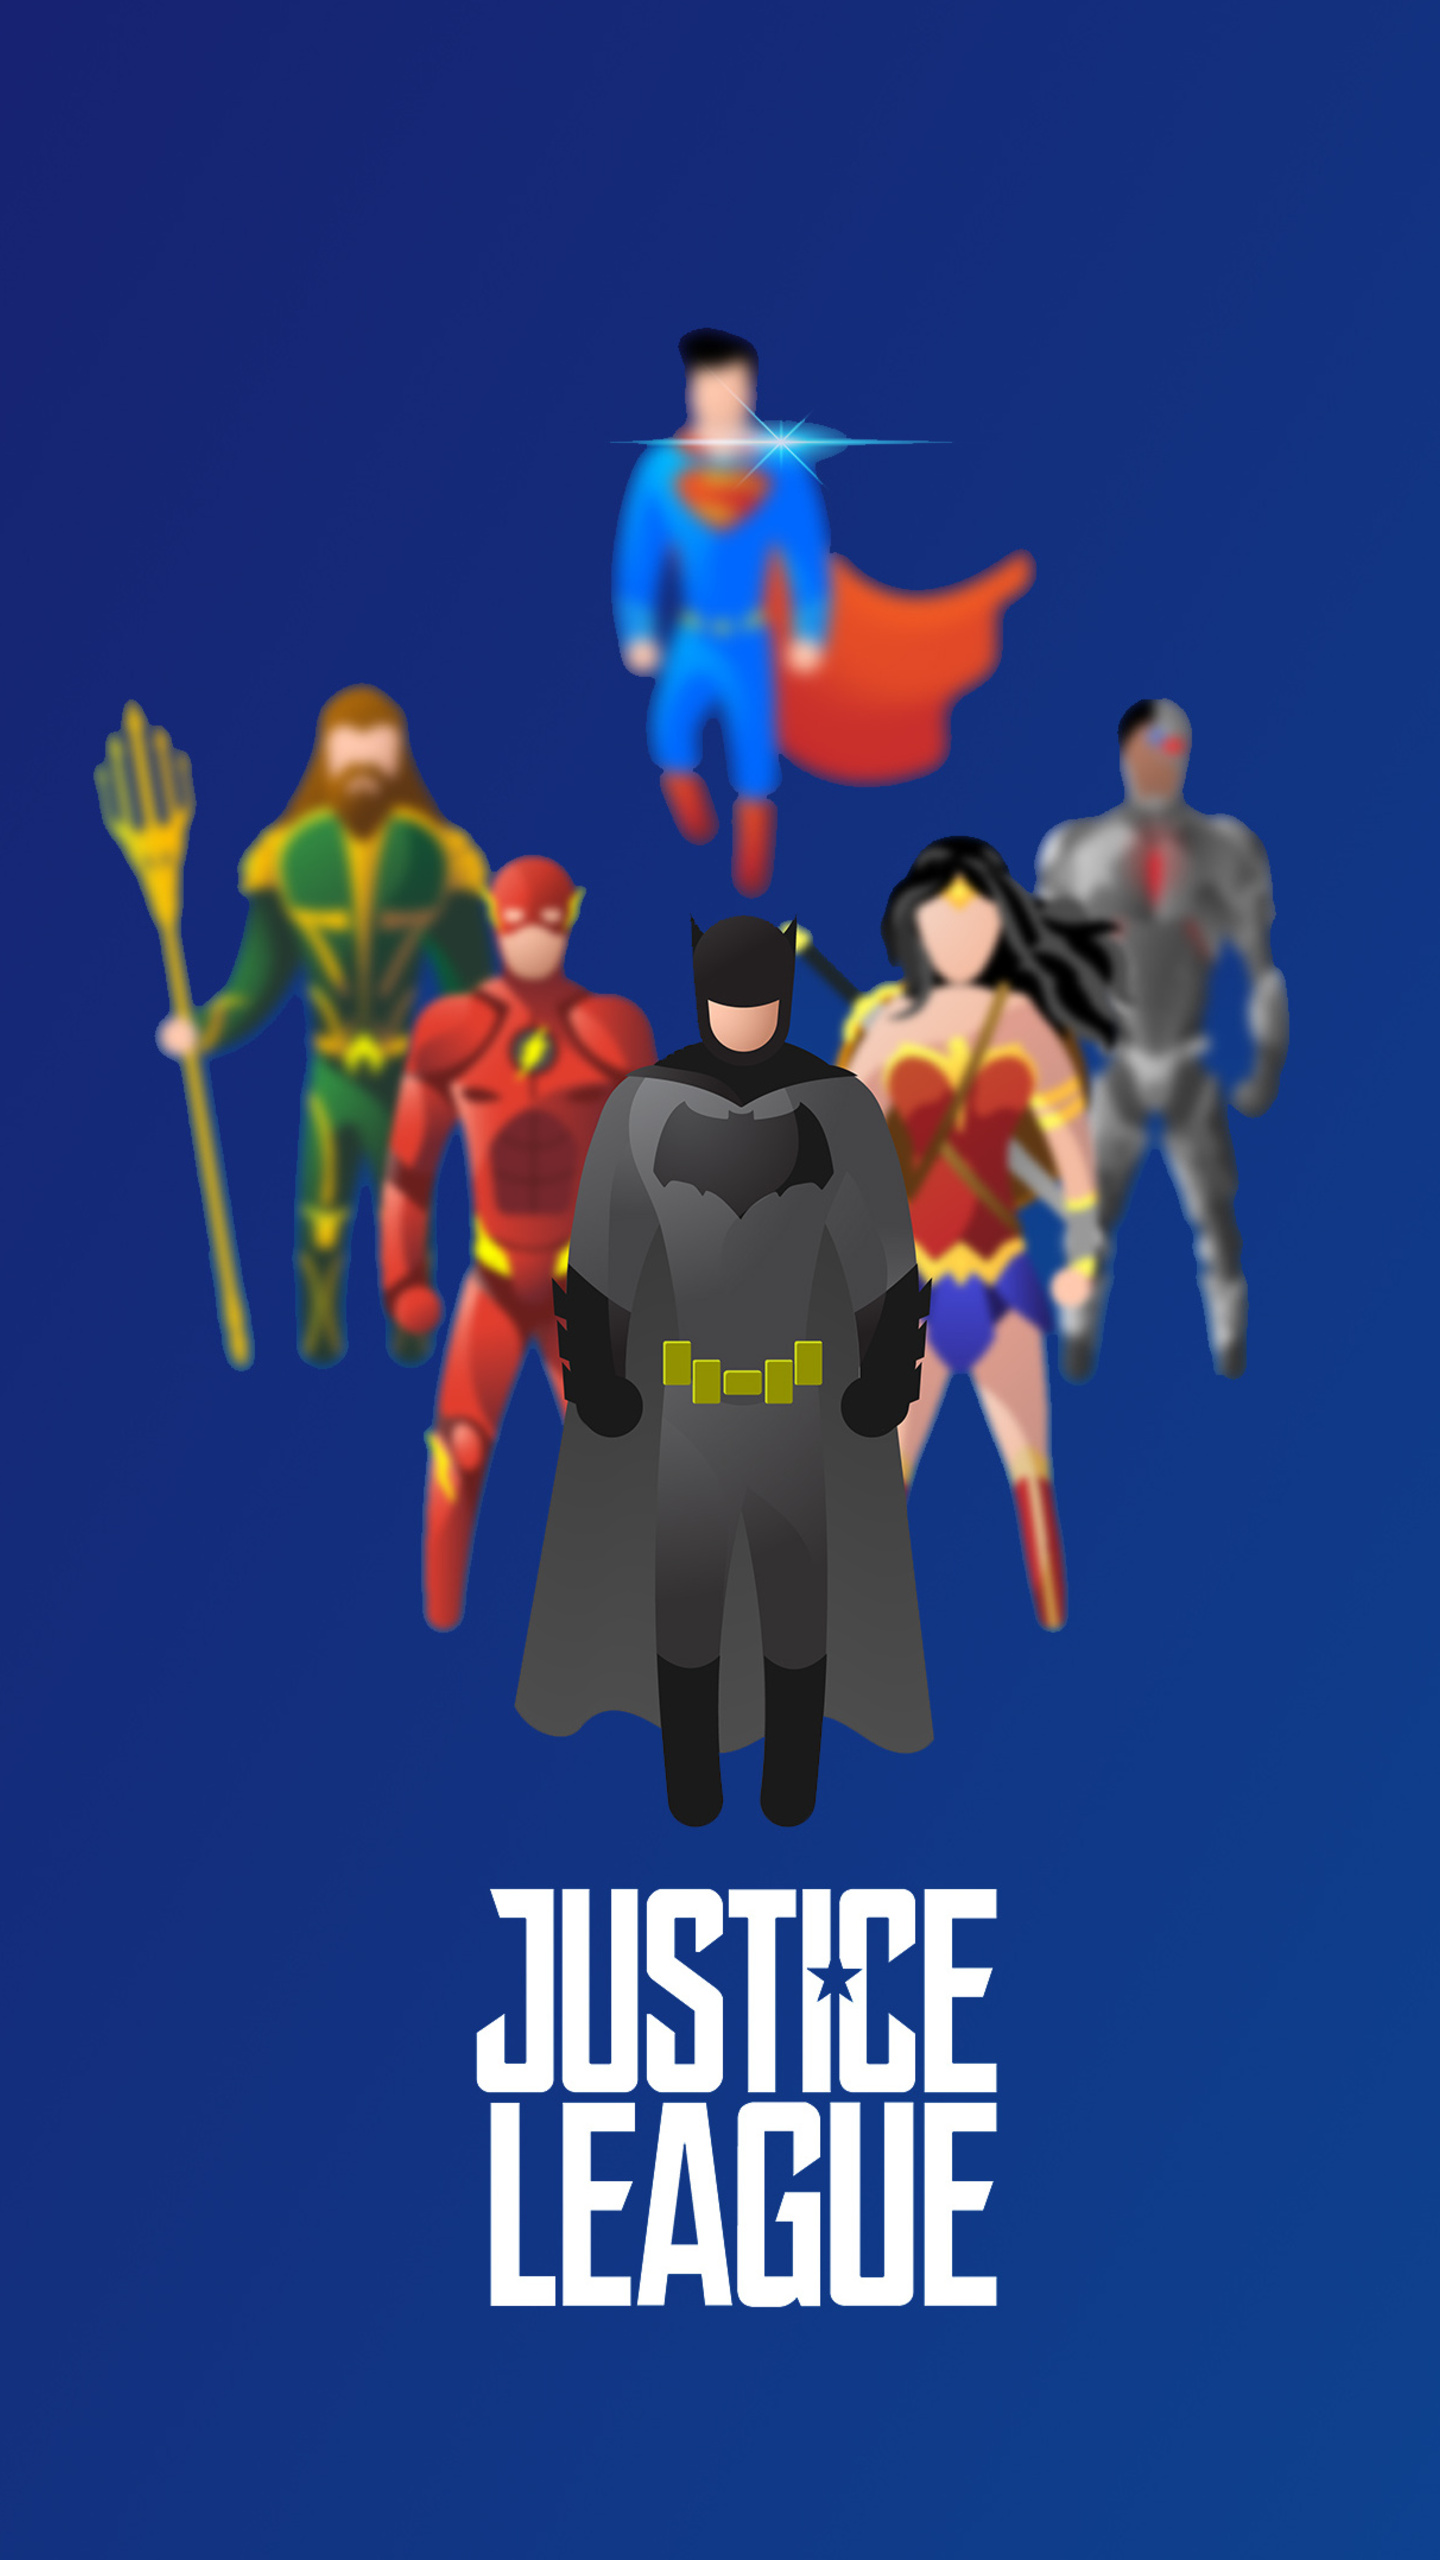 justice-league-superheroes-illustration-4k-1h.jpg